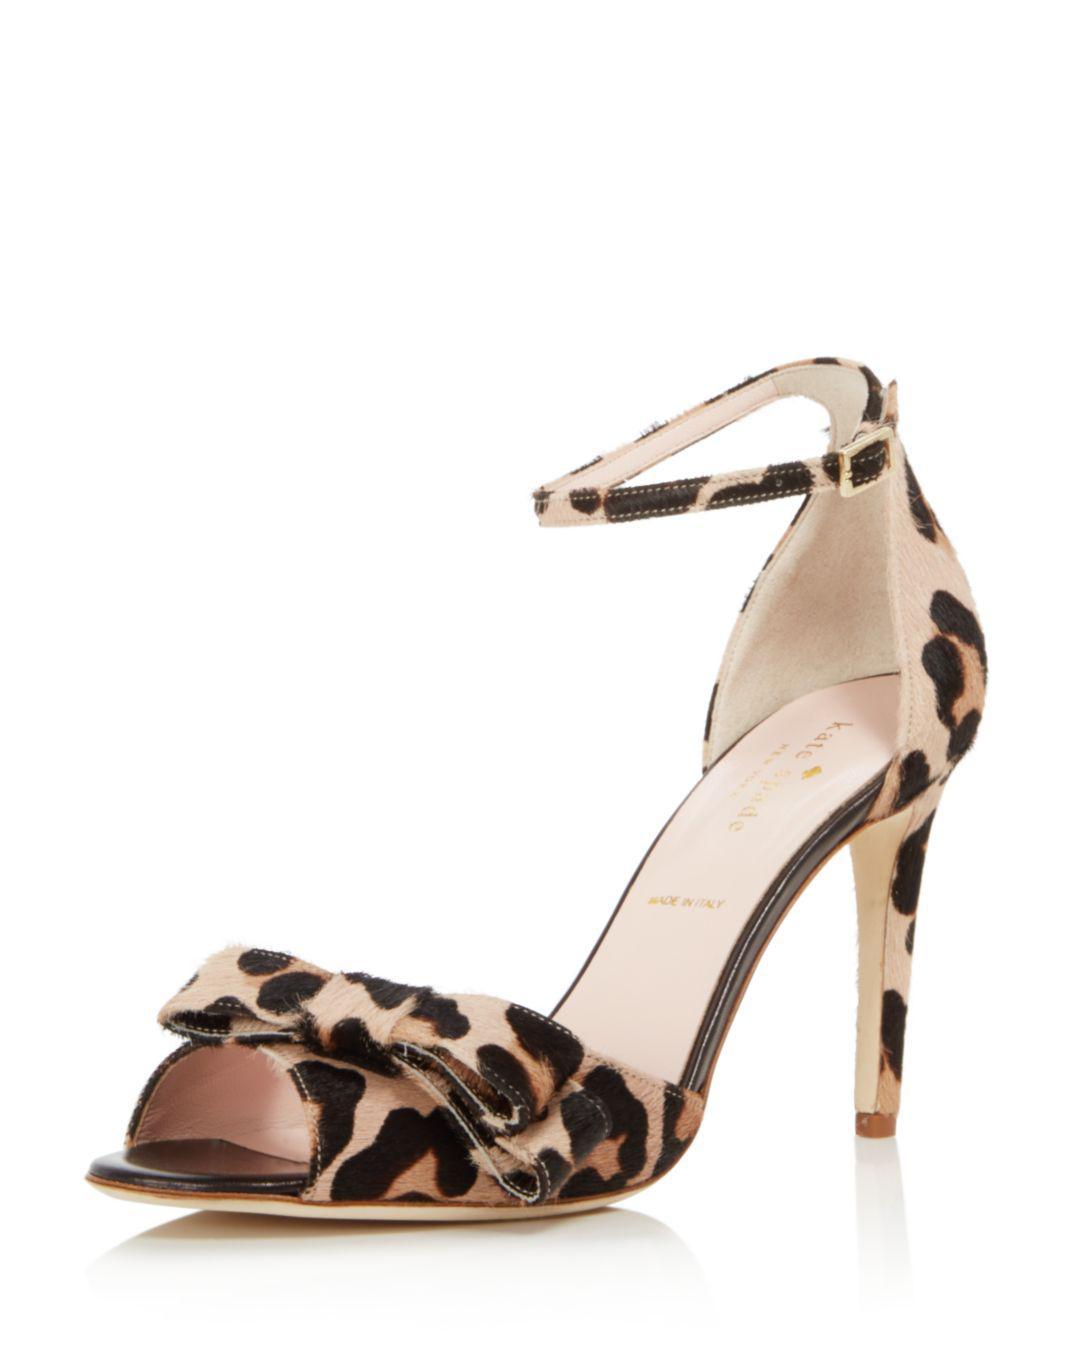 80153f9c8c75 Lyst - Kate Spade Women s Ismay Leopard Print Calf Hair High-heel ...